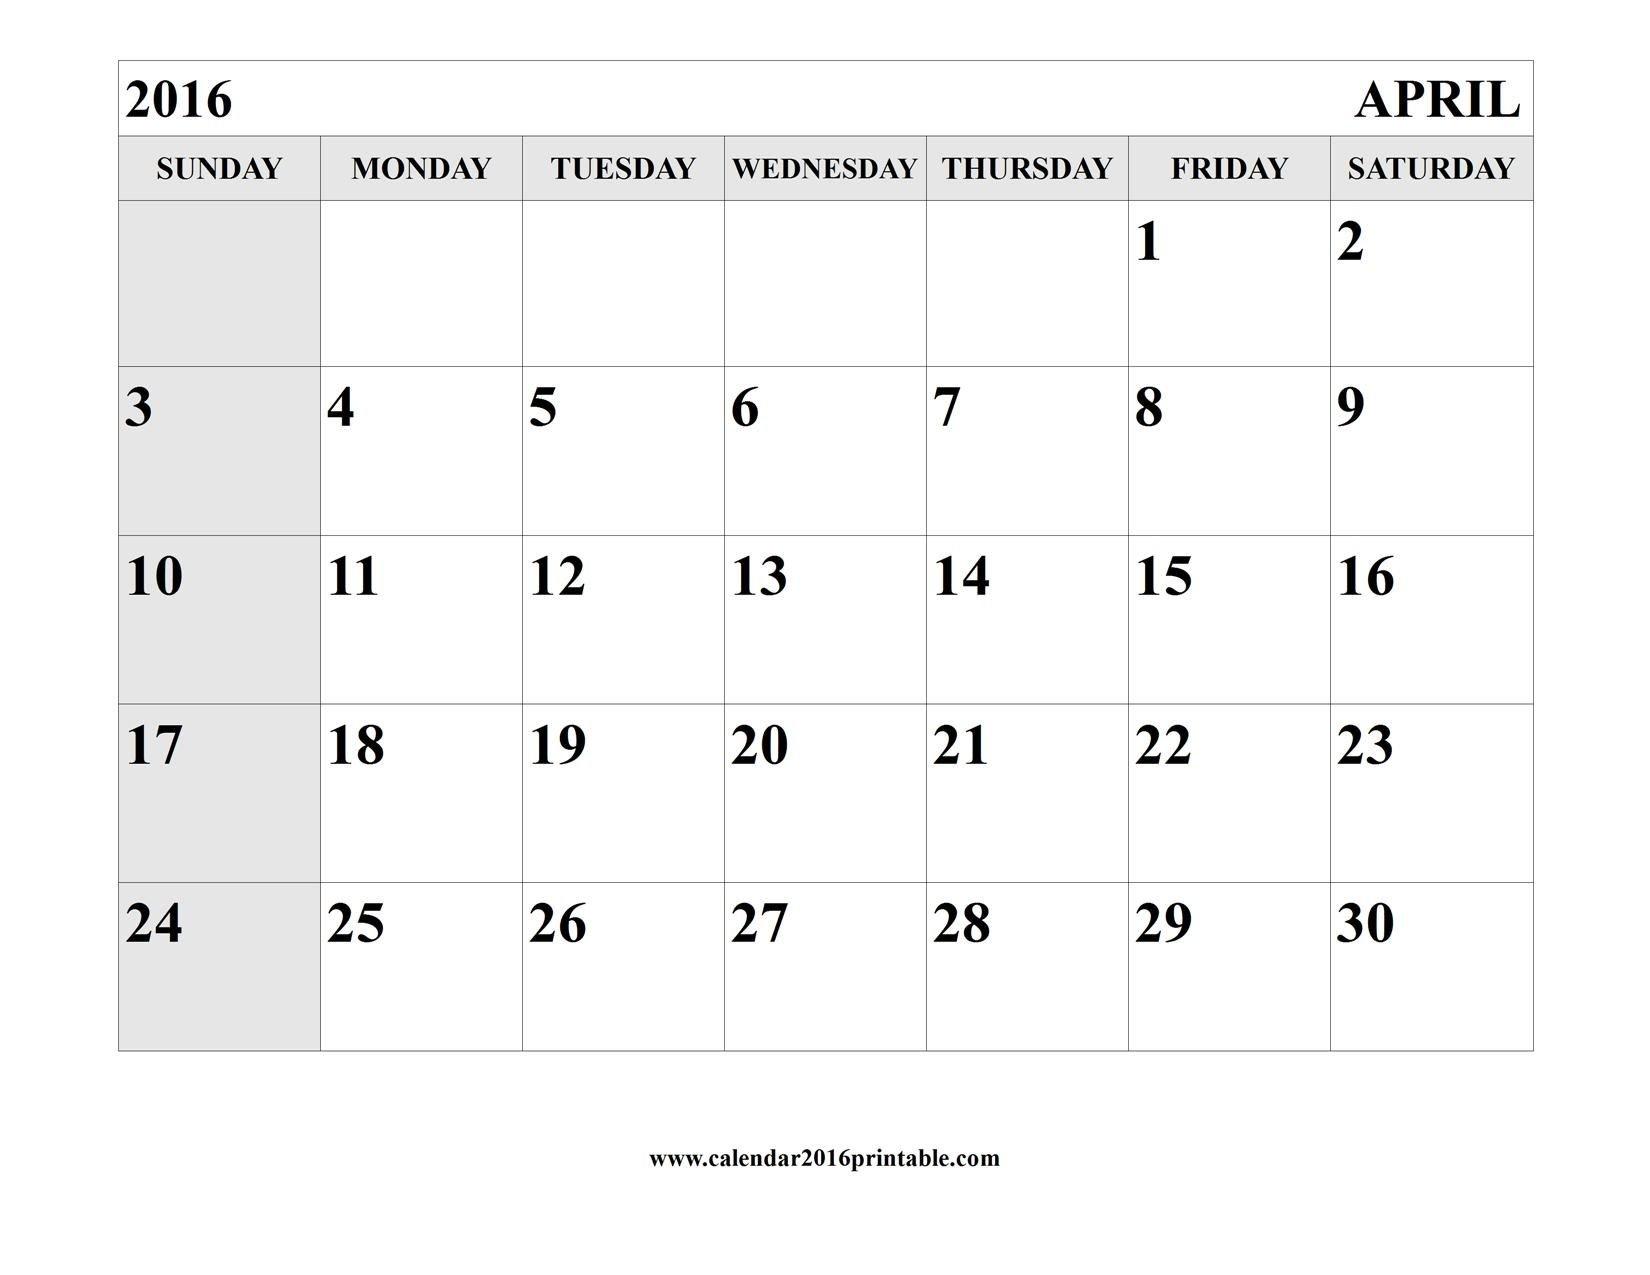 April 2016 Calendar Printable Template | Calendar Template Calanda Templete That I Can Edit